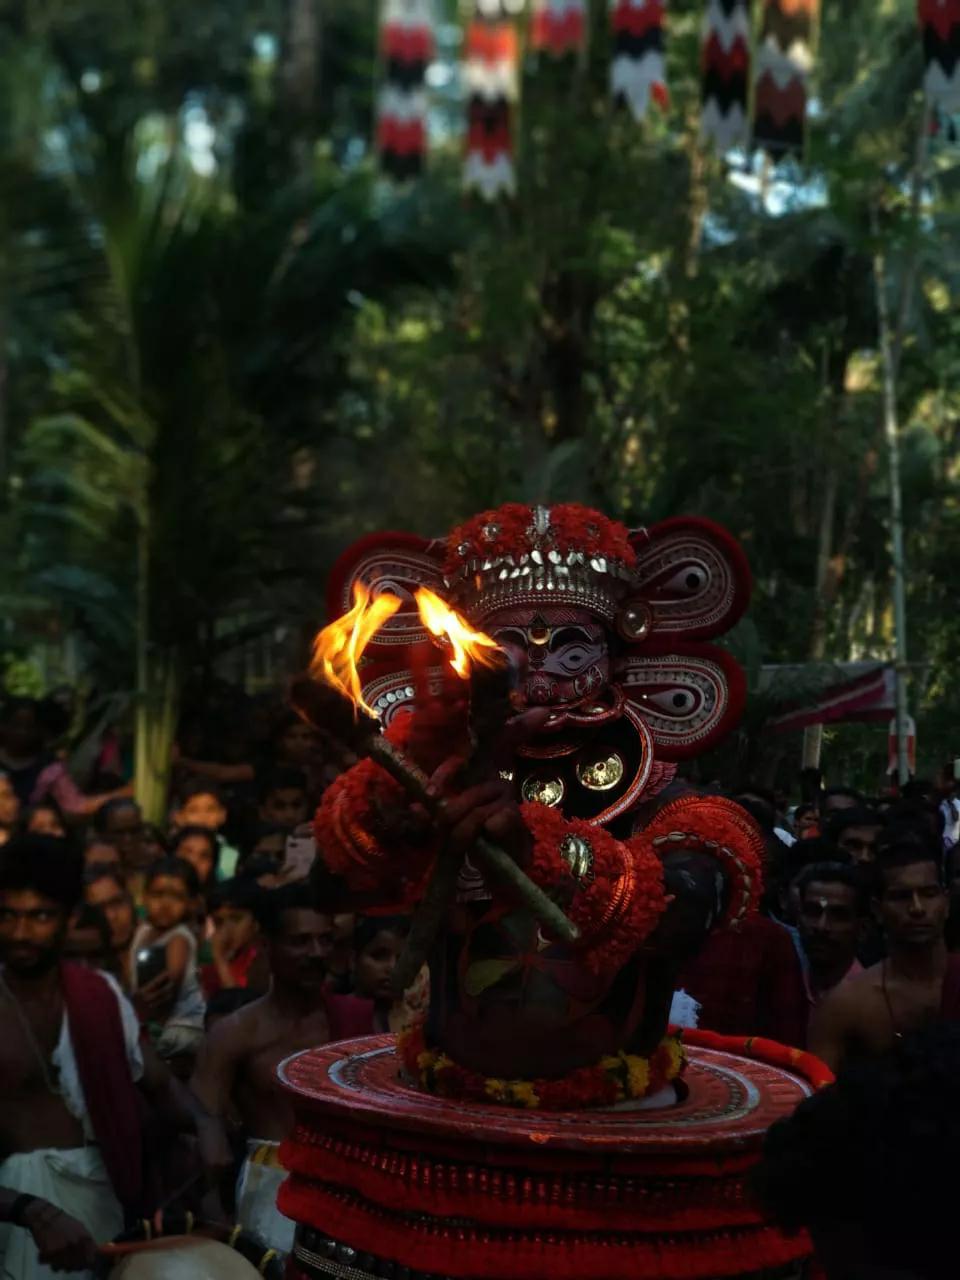 Kuttichathan Theyyam - കുട്ടിച്ചാത്തന് തെയ്യം 3